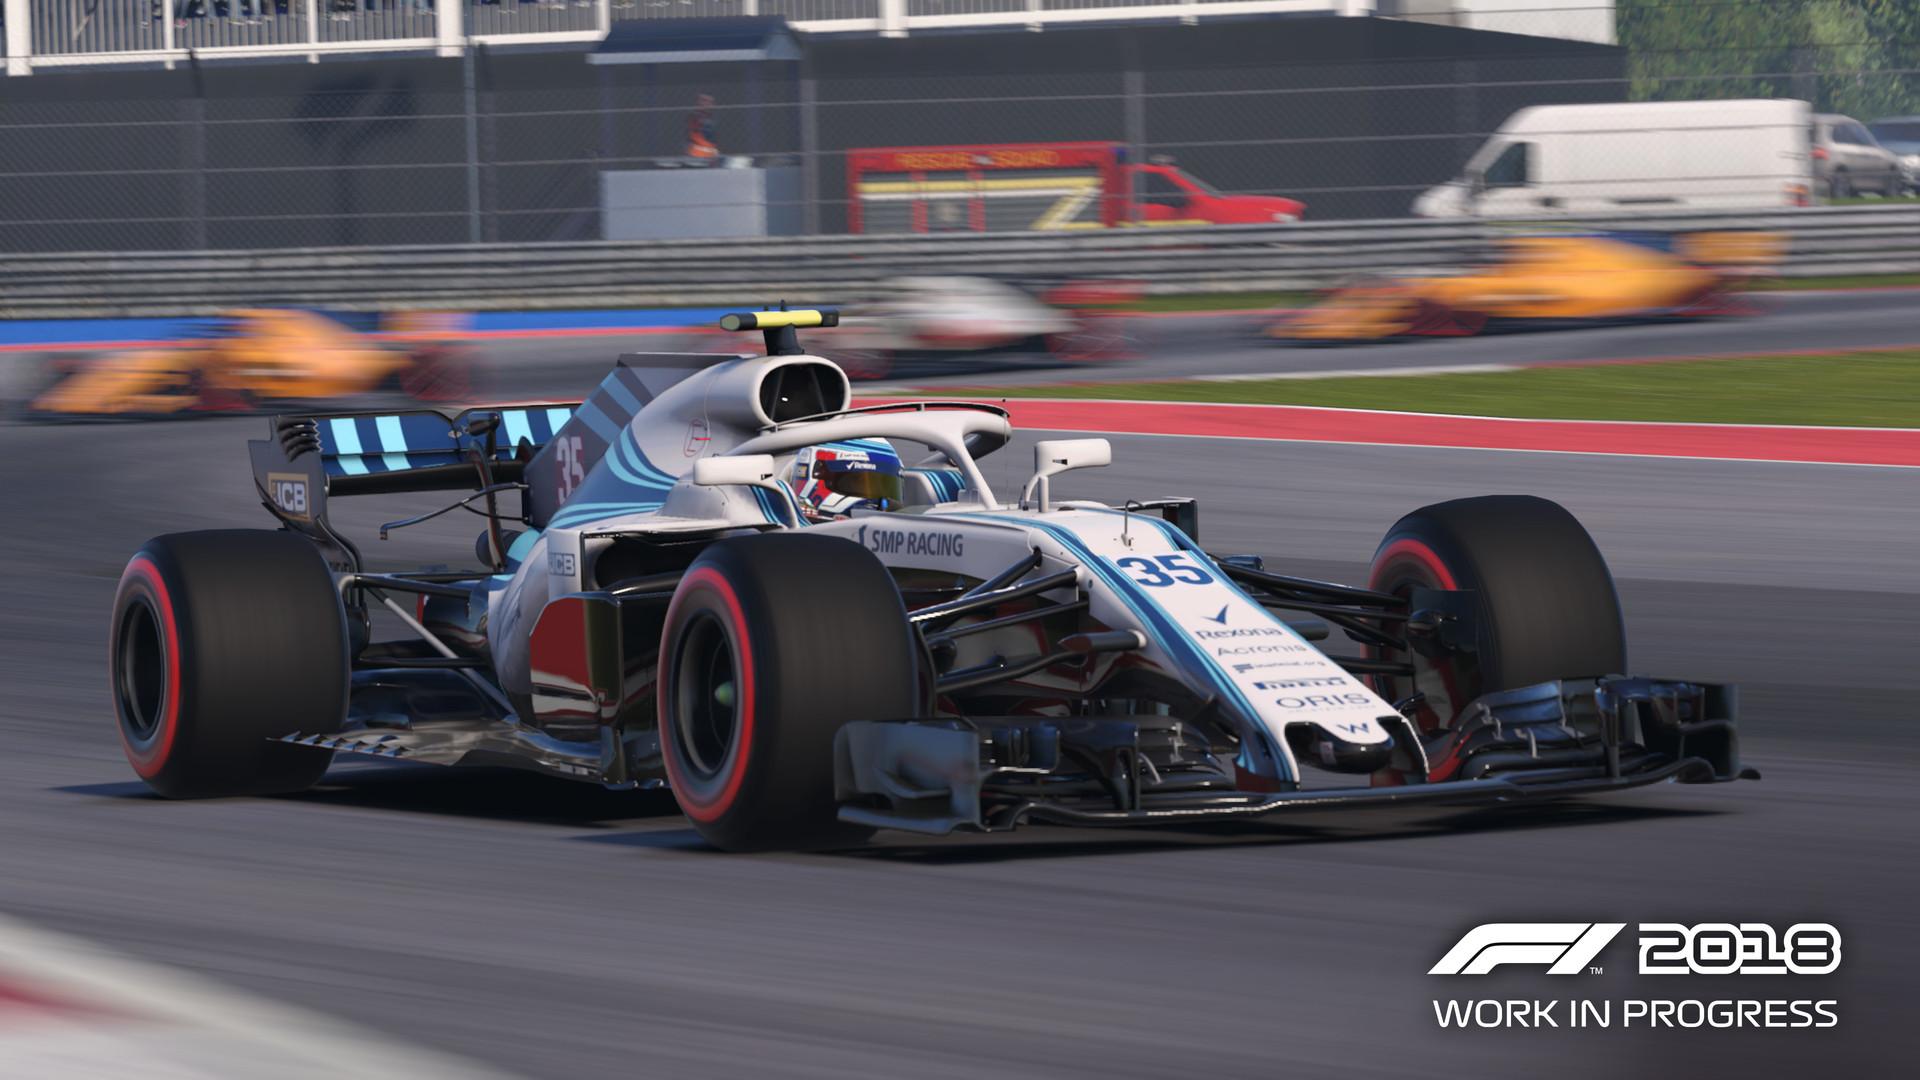 F1 2018 [2018|Rus|Eng|Multi10]